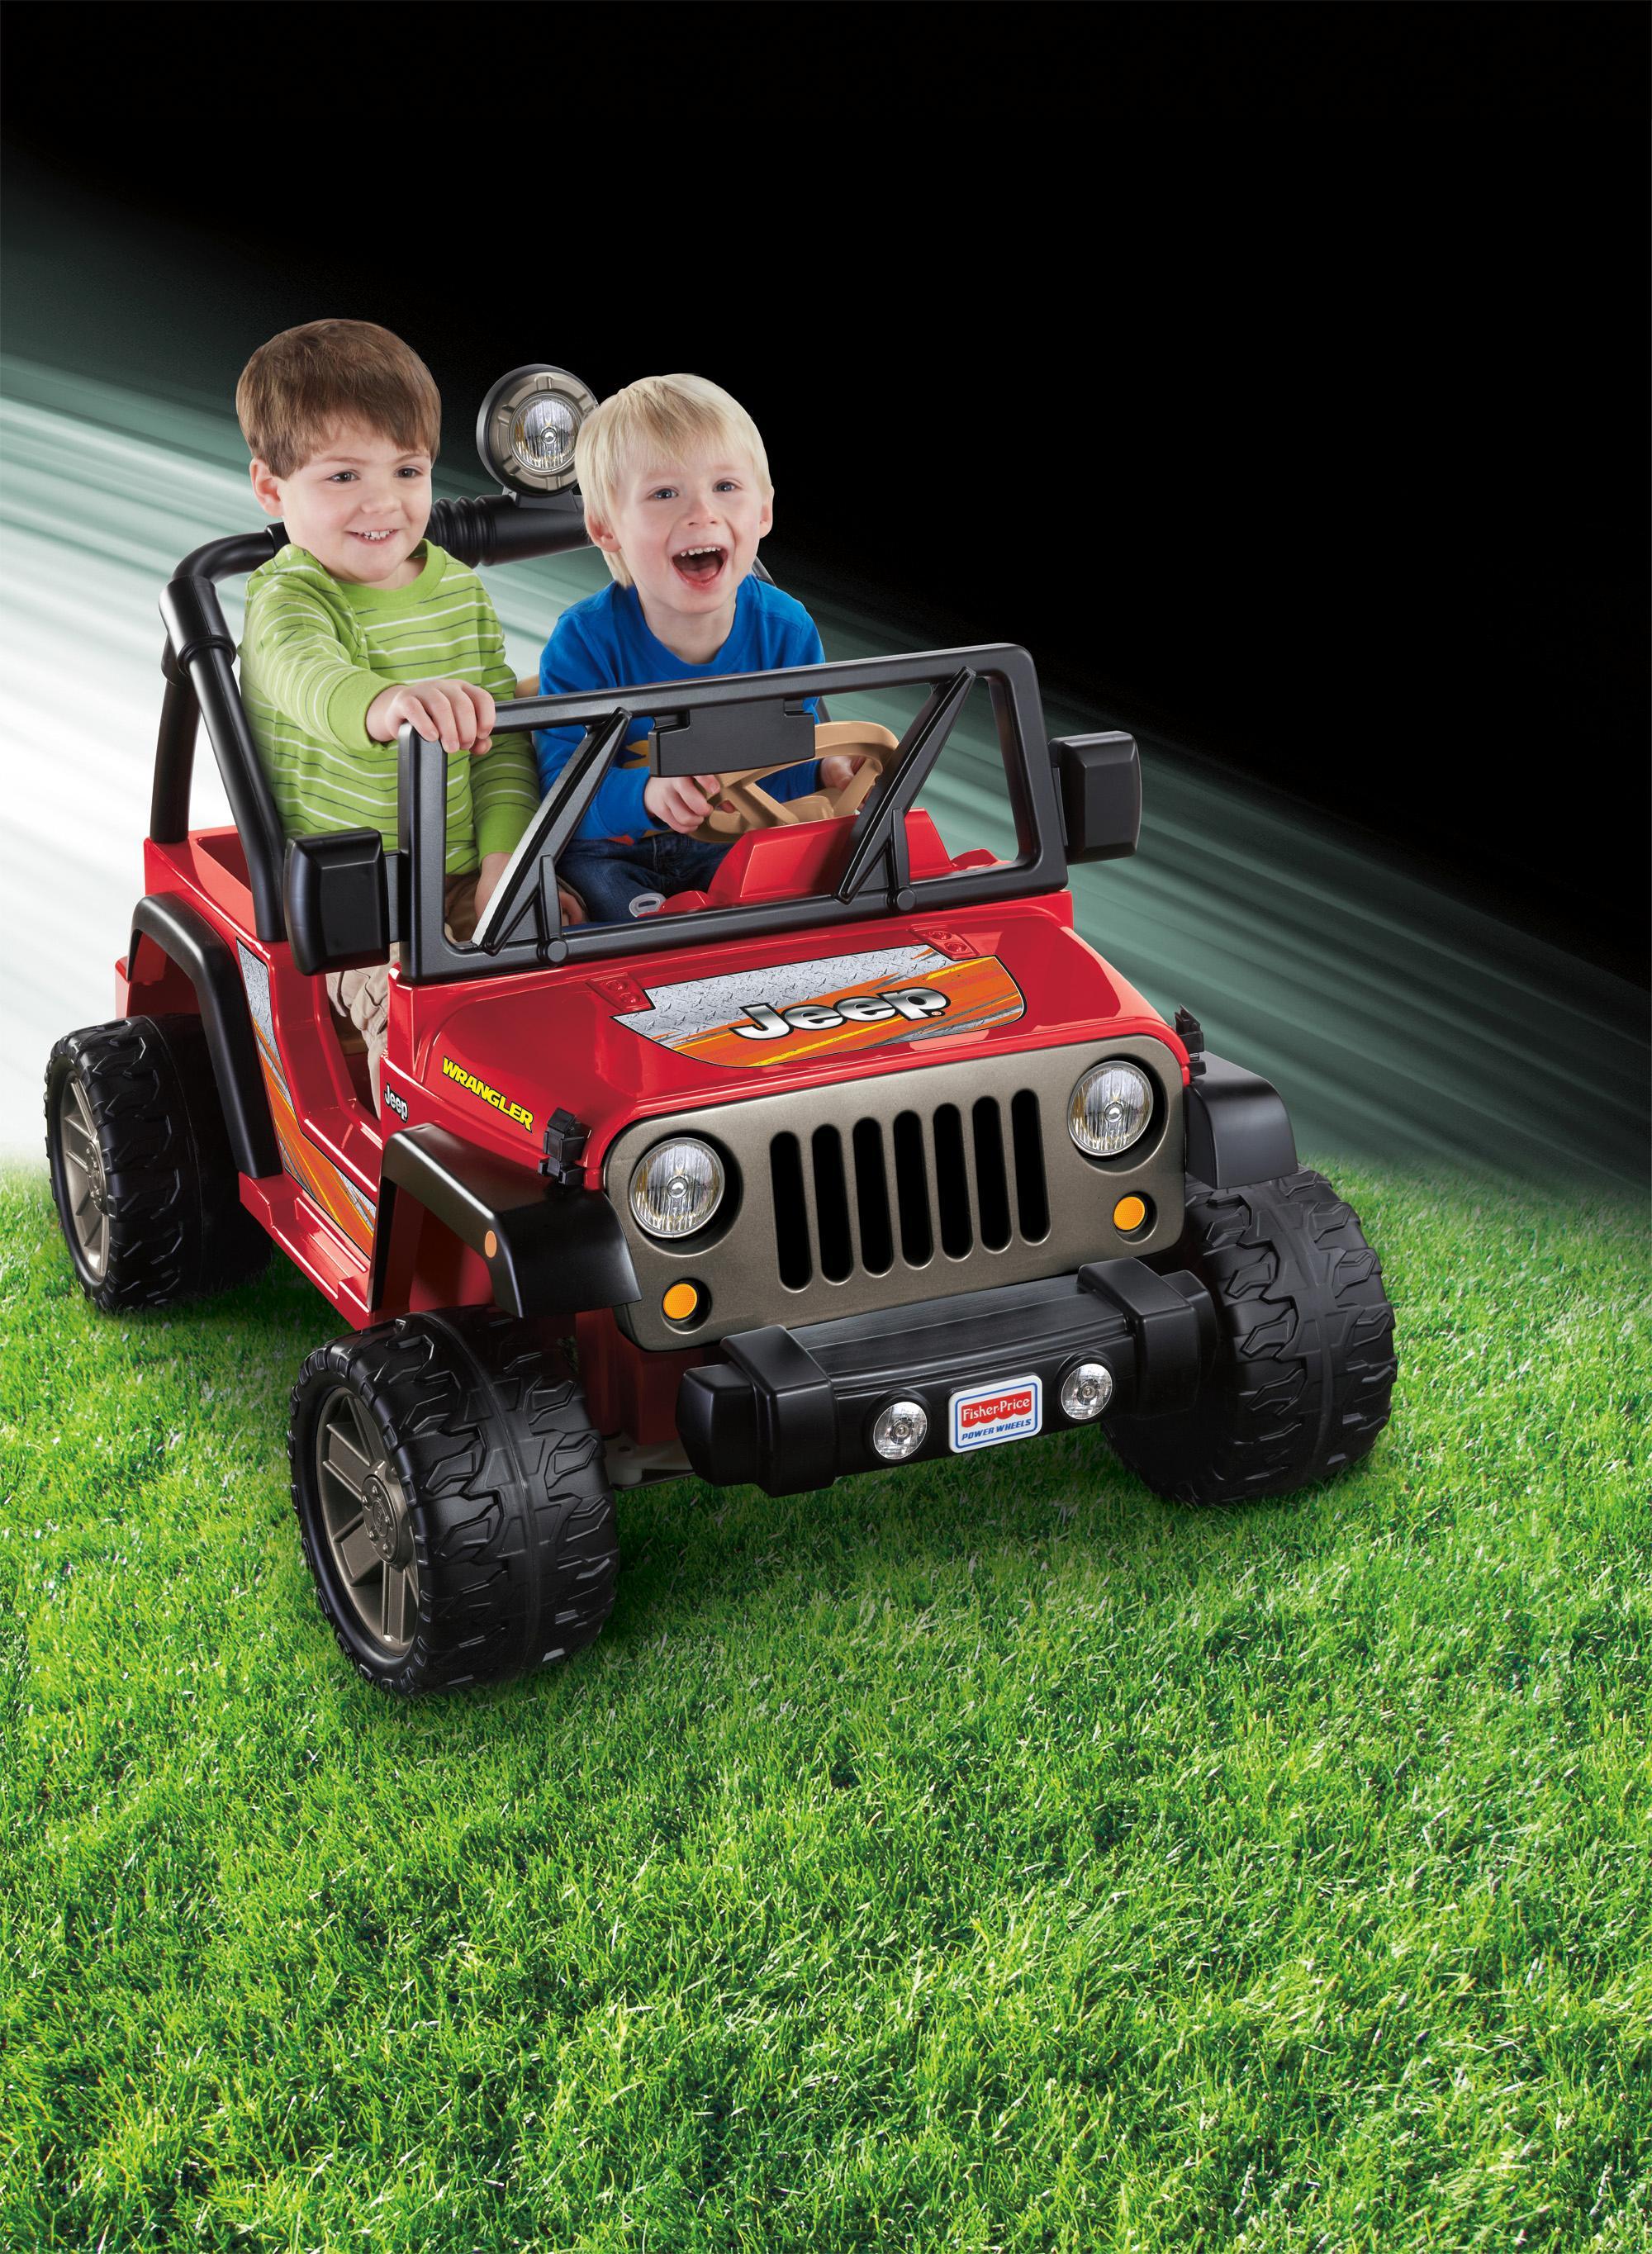 Fisher Price Power Wheels Jeep Wrangler Kids Battery